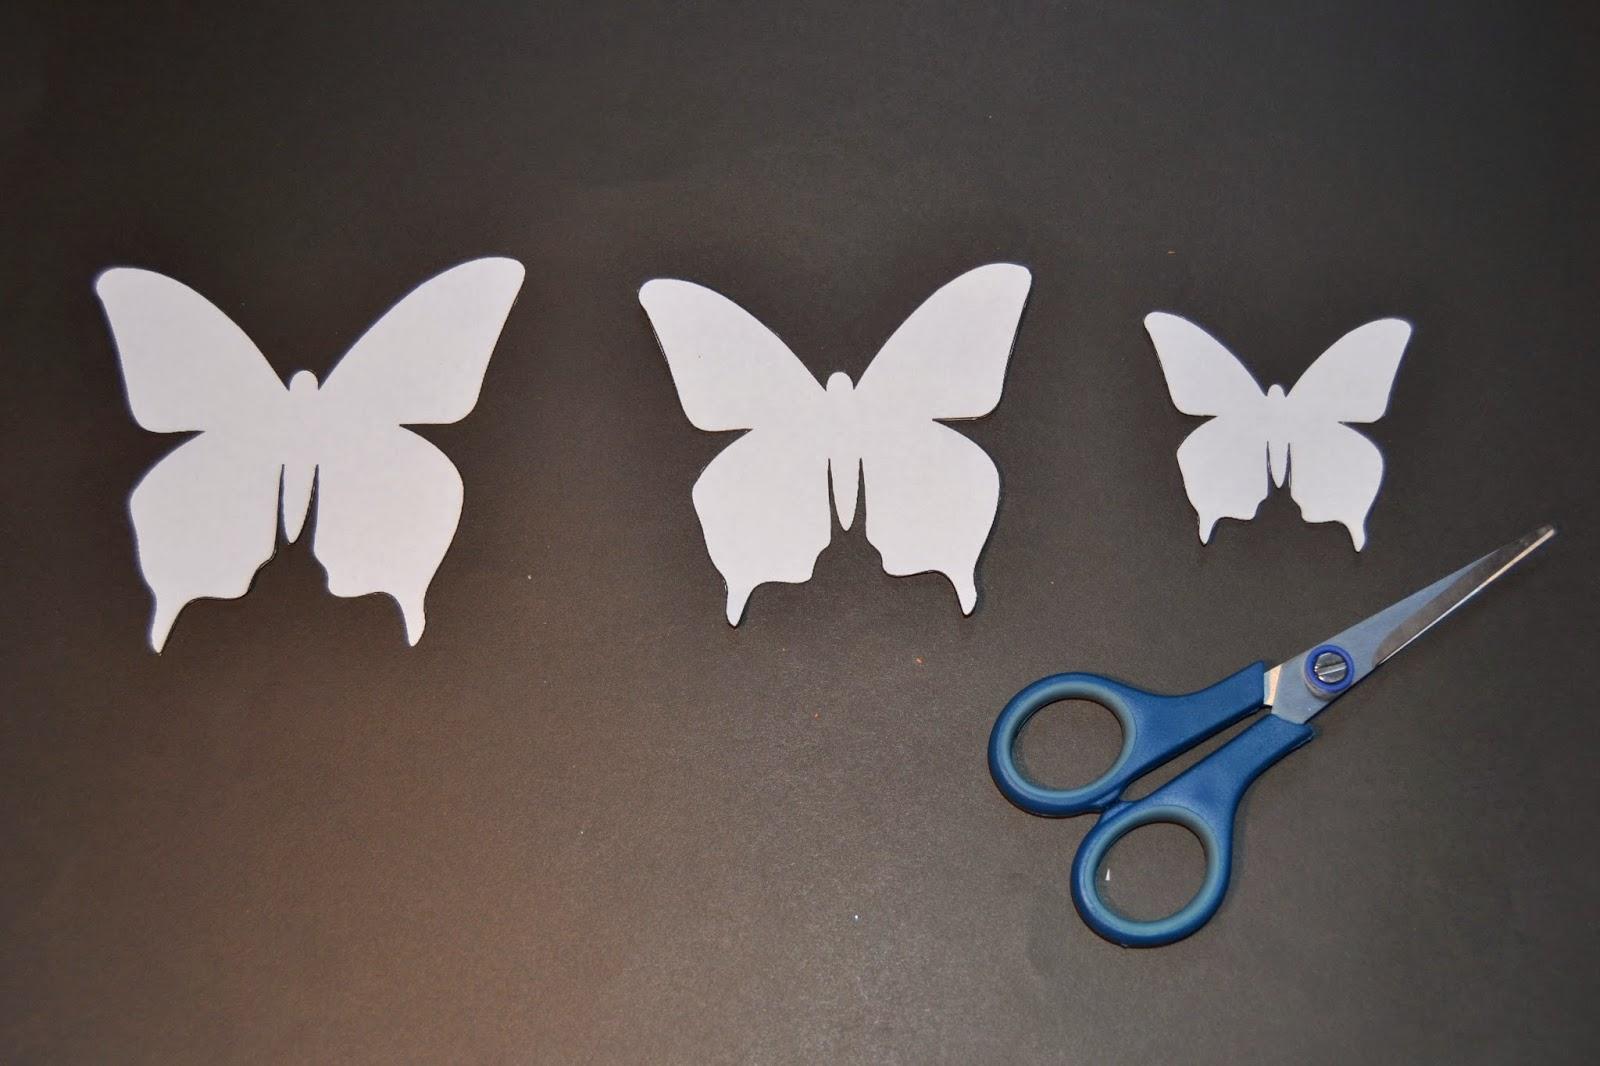 Trasteando mariposas - Plantillas de mariposas ...